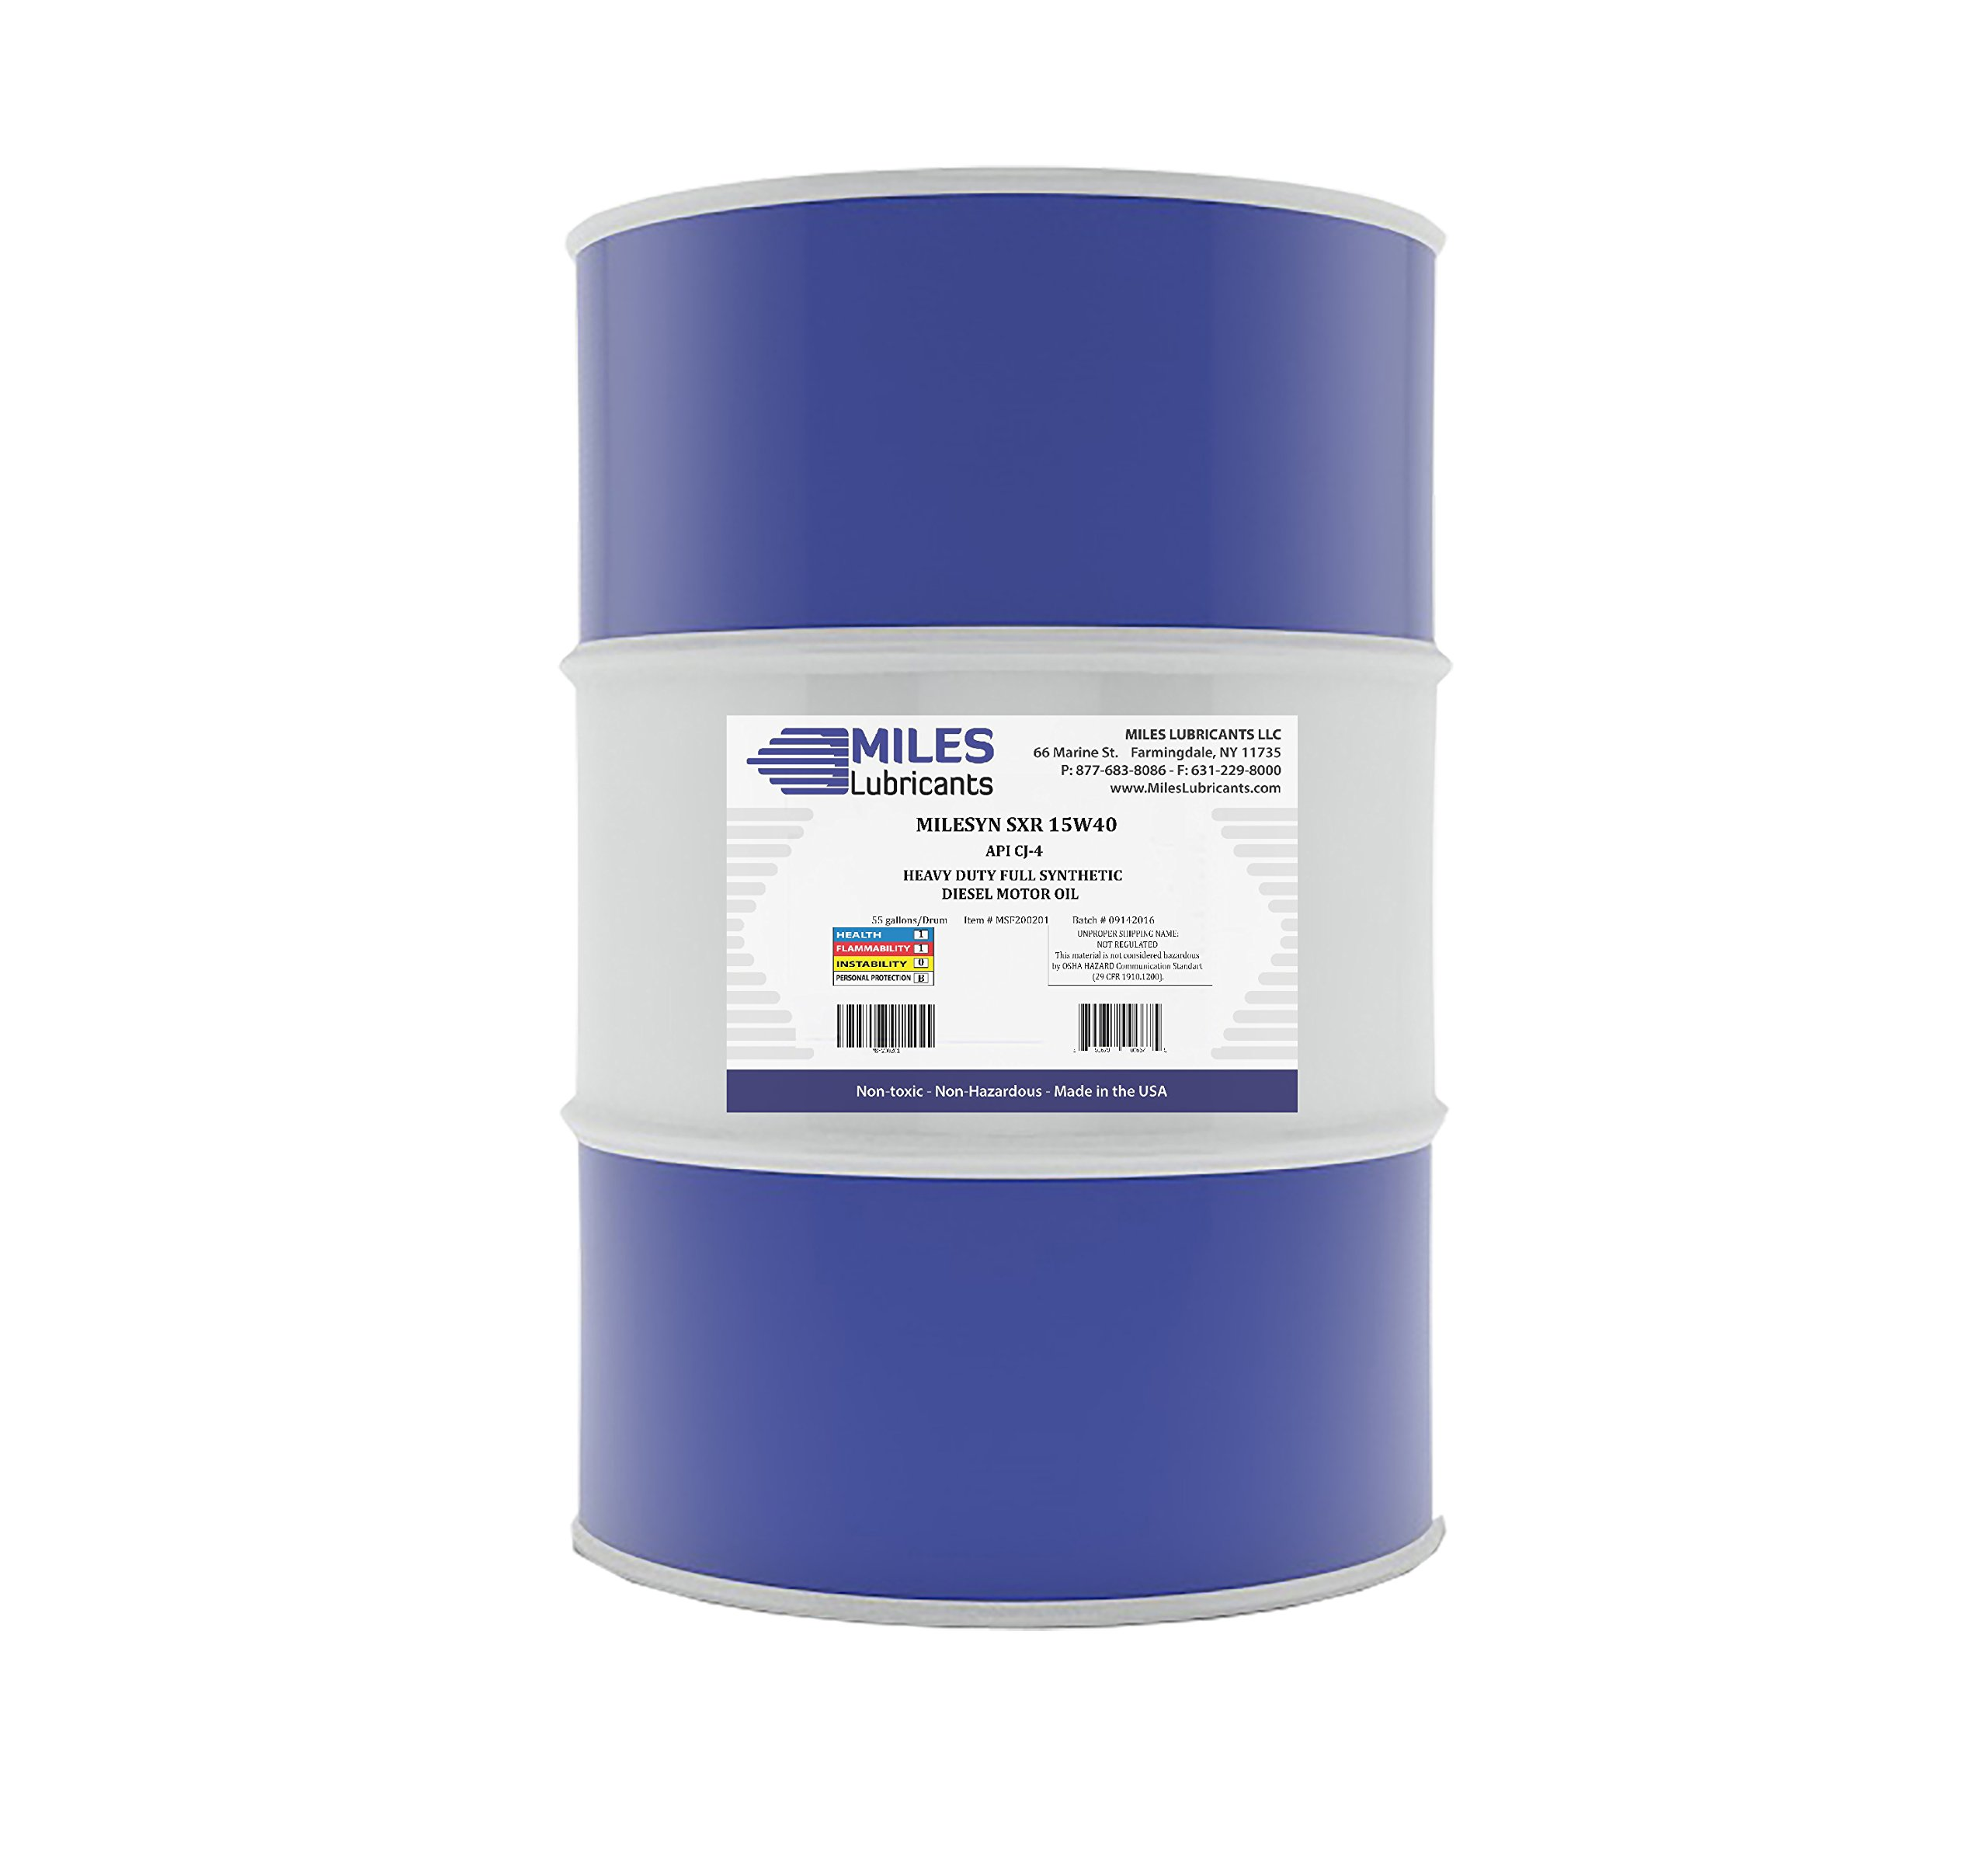 Milesyn SXR 15w40 API CJ-4 Full Synthetic Diesel Motor Oil 55 Gallon Drum